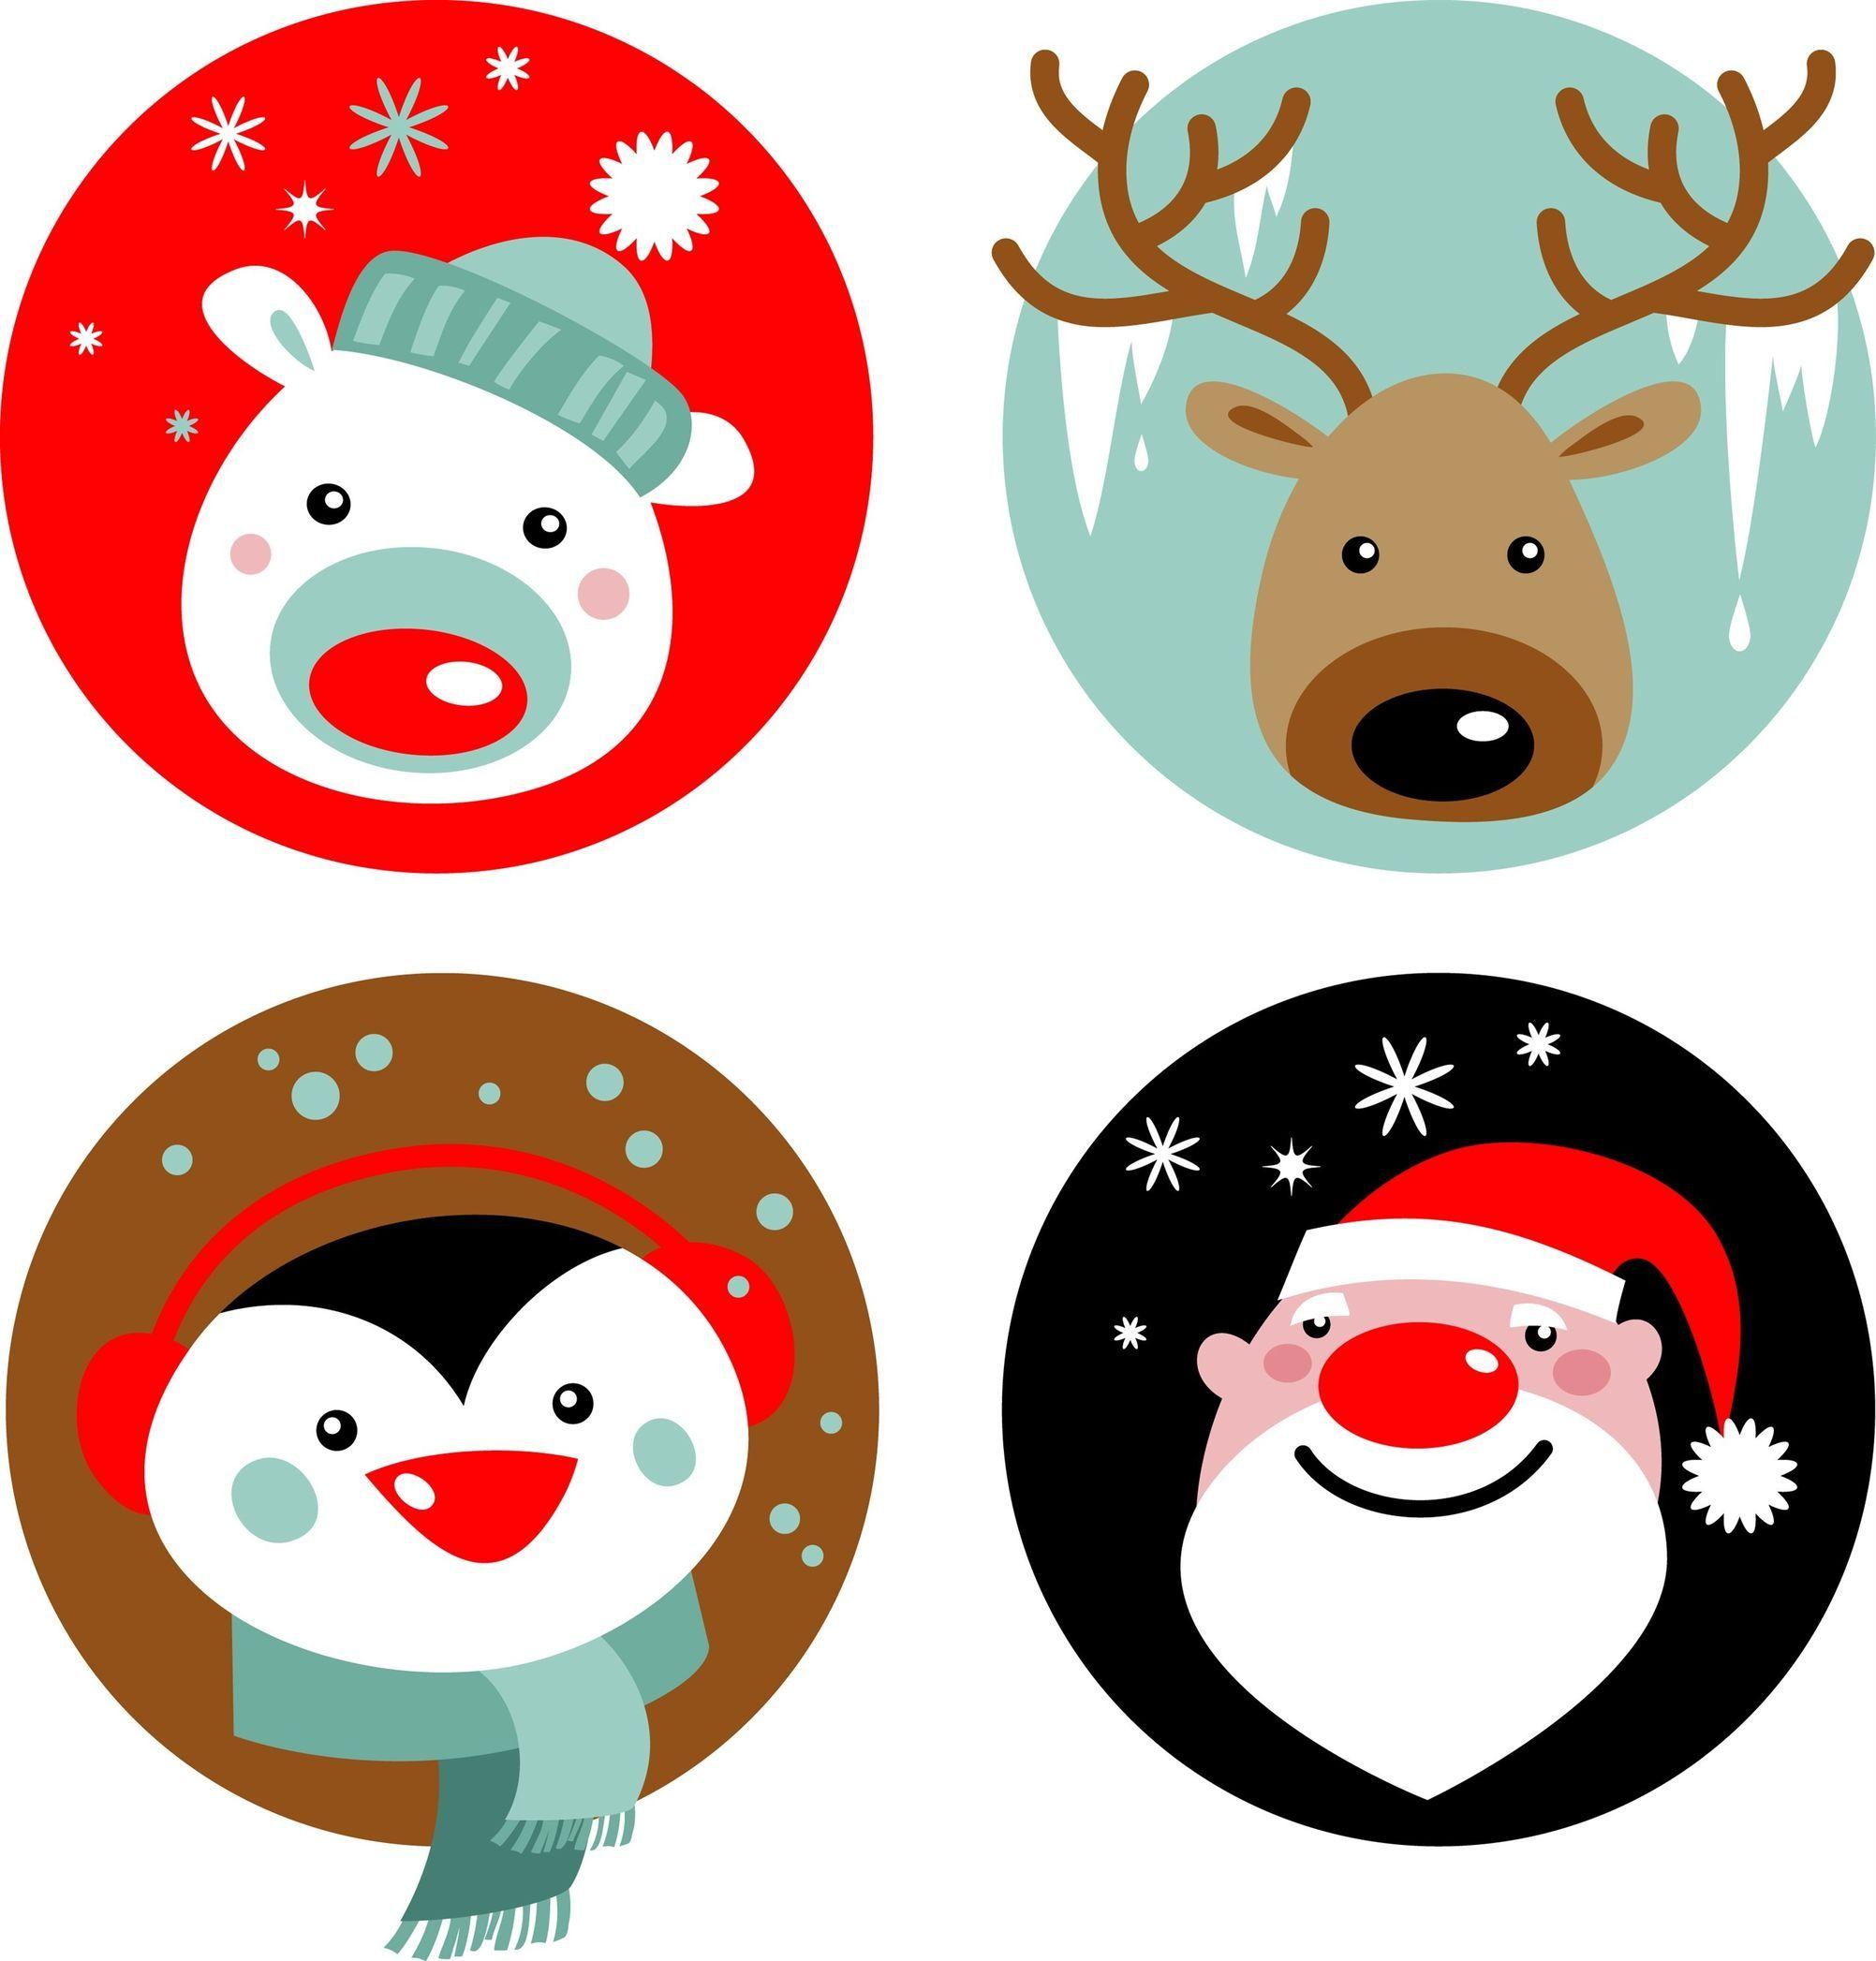 Dibujos para imprimir de navidad navidad natal natal - Dibujos tarjetas navidenas ...